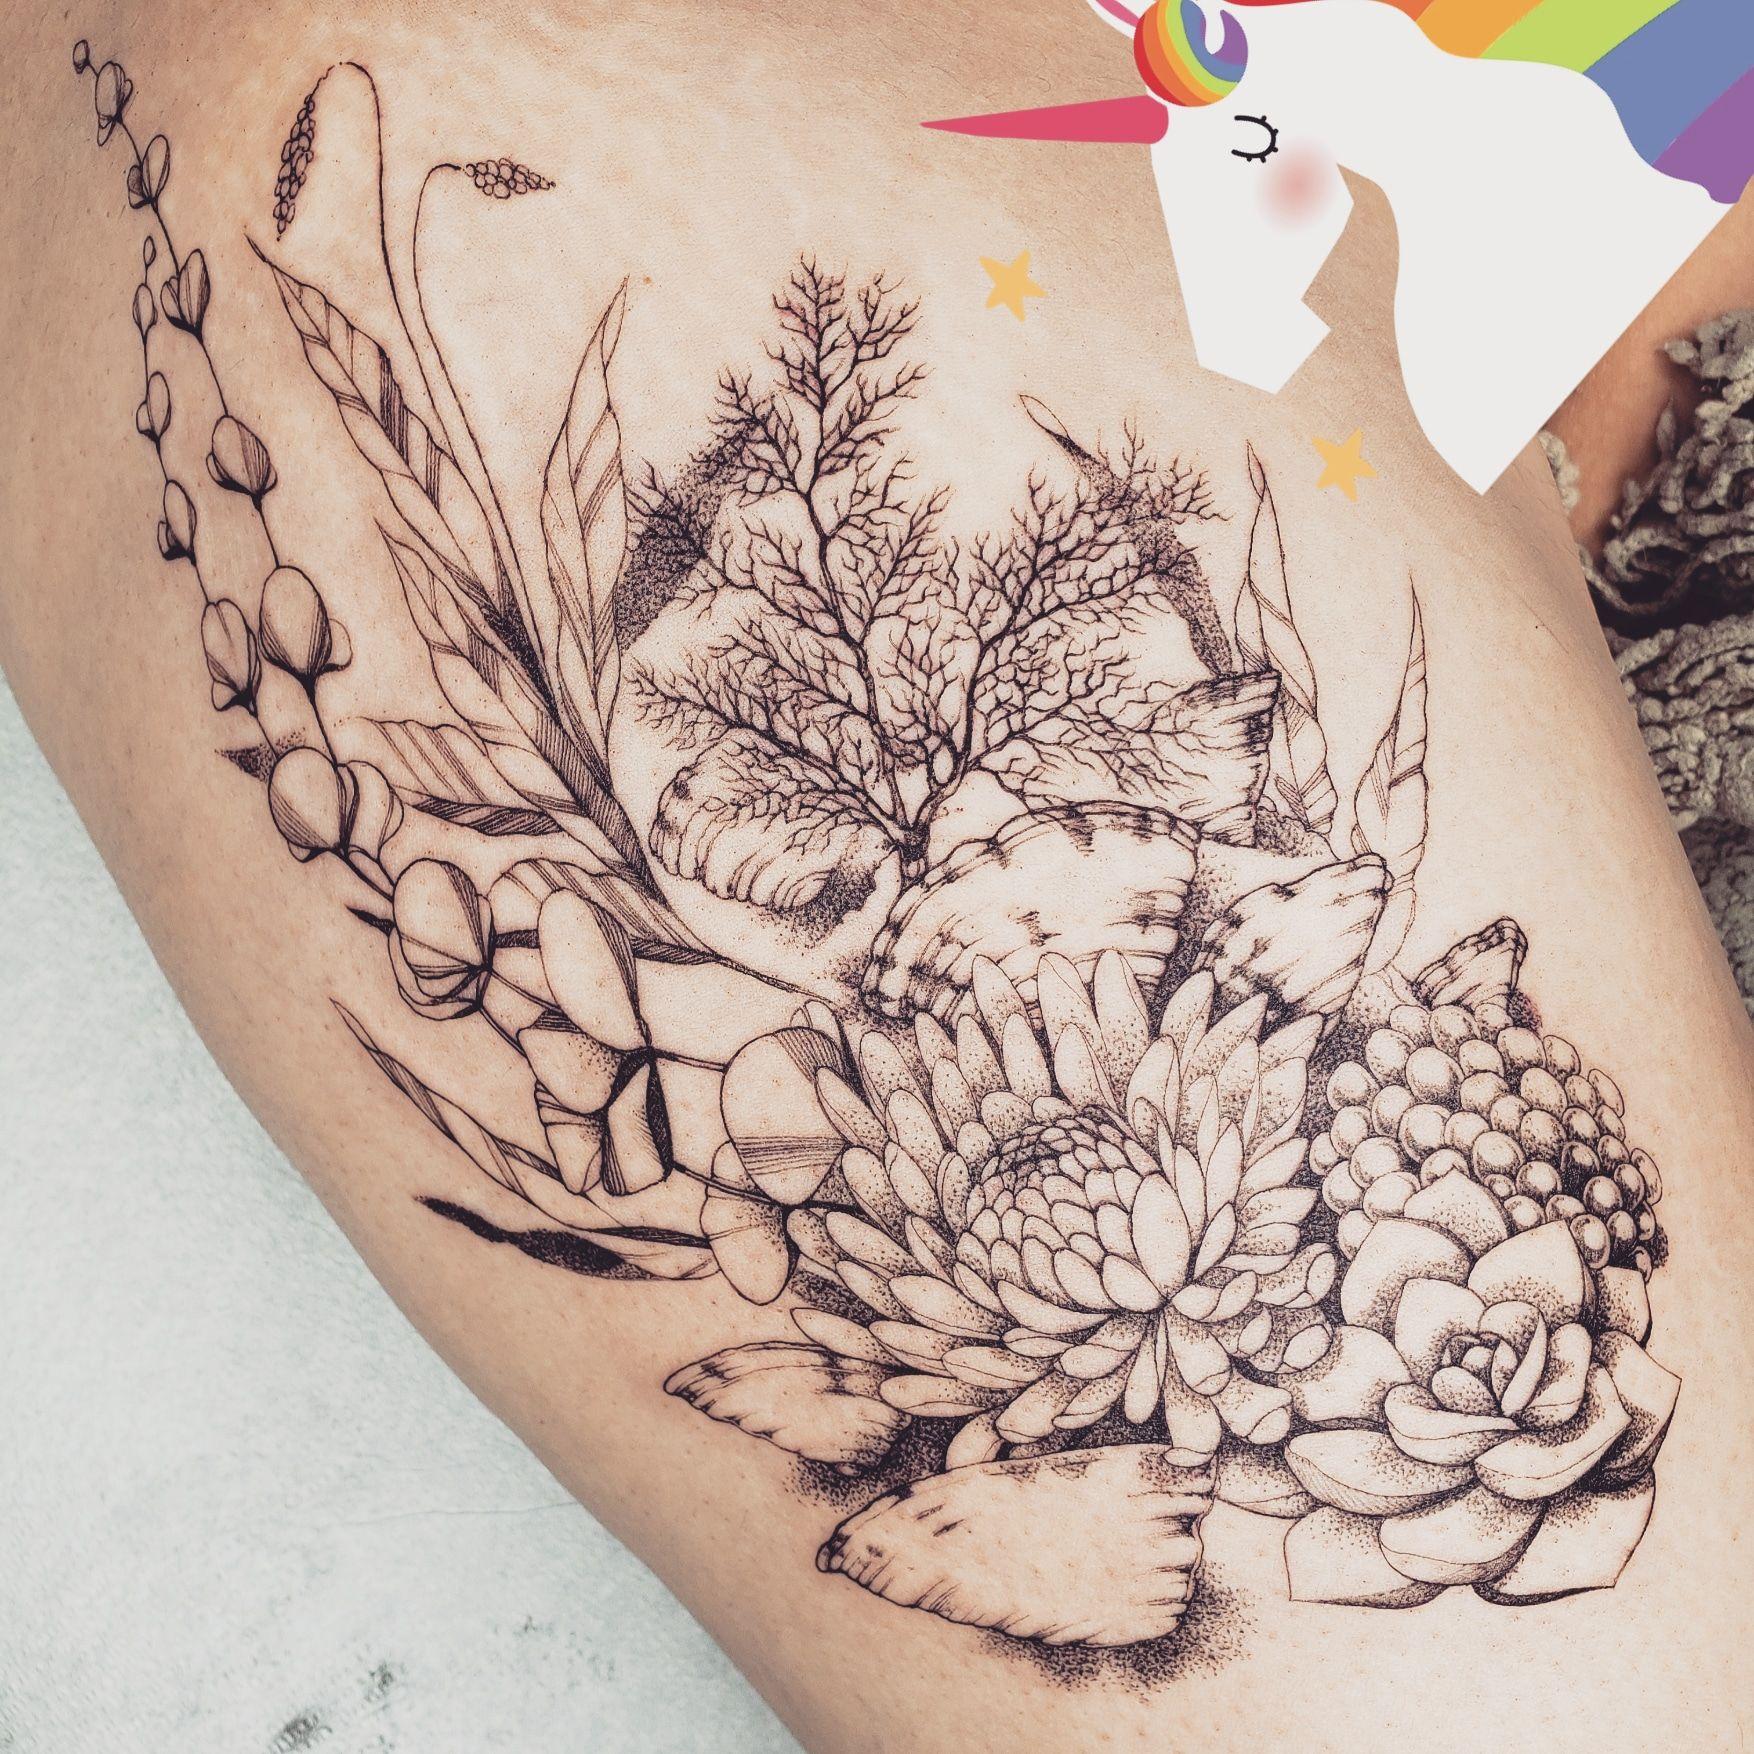 My Fine Line Underwater Houseplant Scene Mackenzie Evangeline Northern Tattoo Vancouver Cana In 2020 Ocean Sleeve Tattoos Colorful Sleeve Tattoos Ocean Theme Tattoos